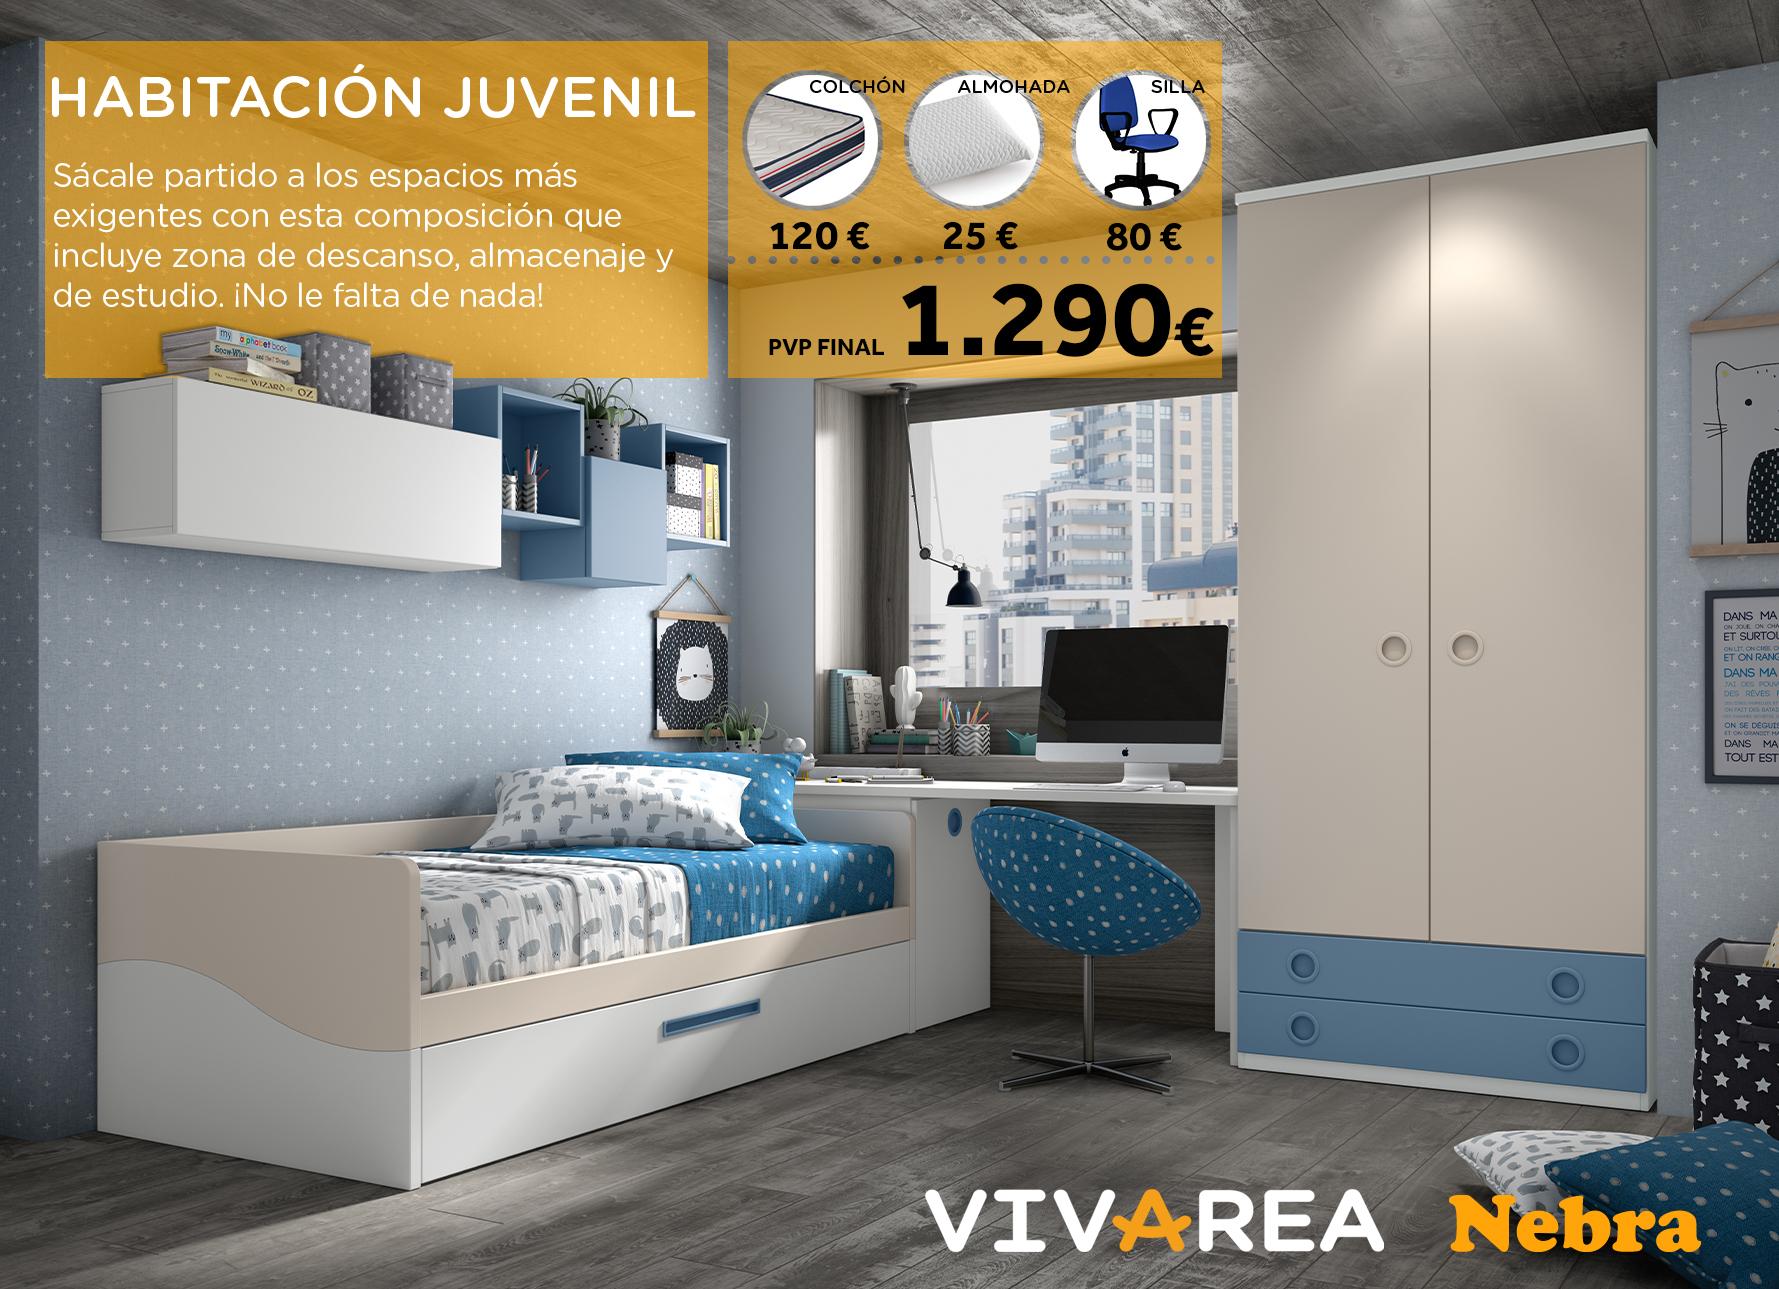 Dormitorios Juveniles Glicerio Chaves